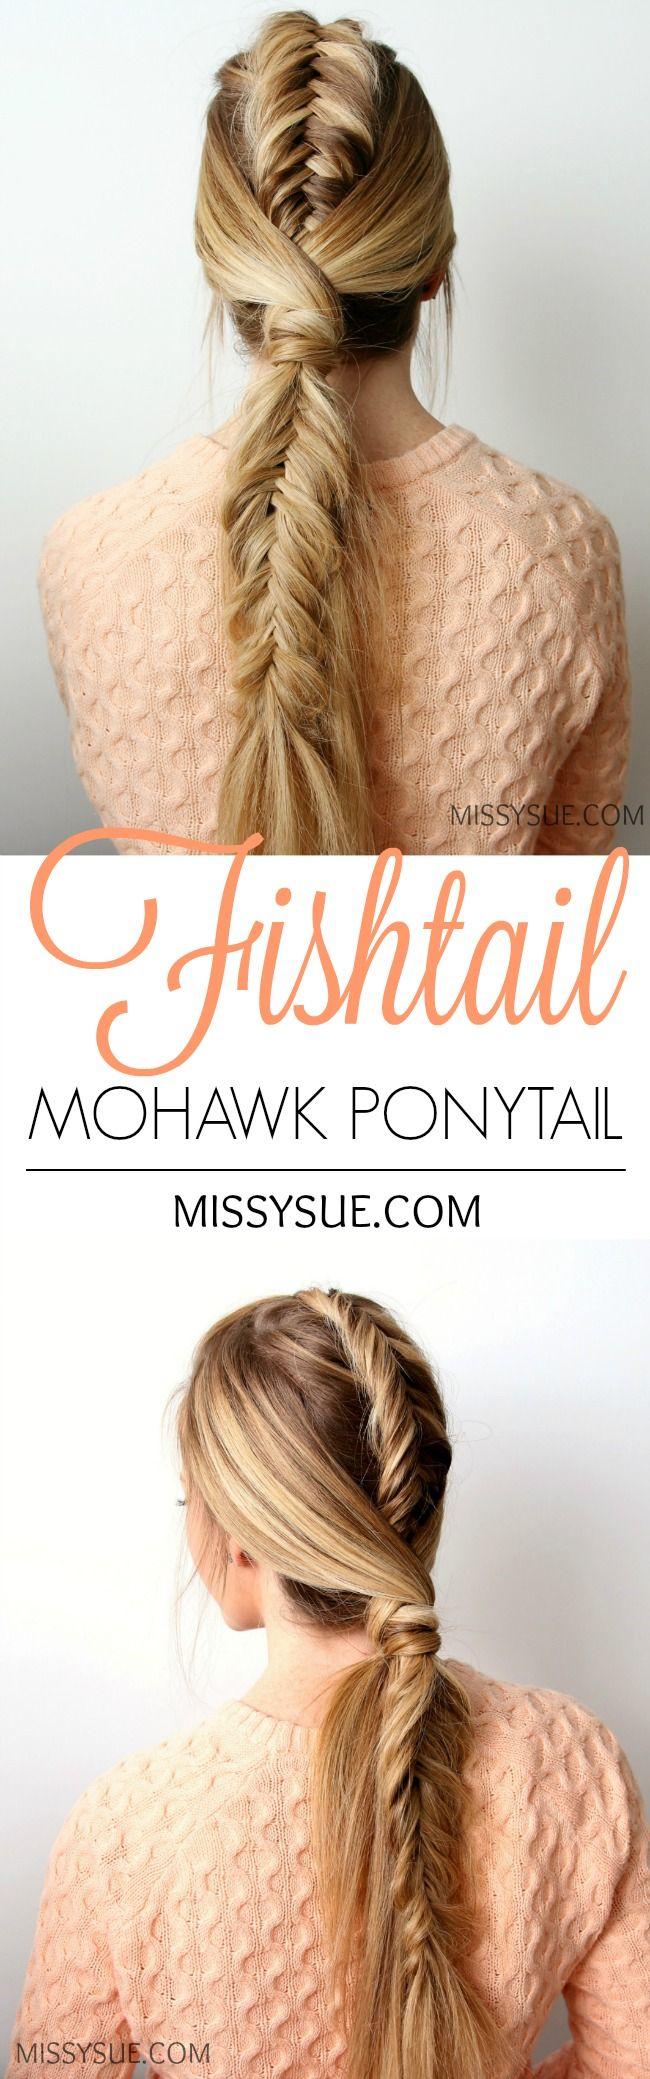 Fishtail Mohawk Ponytail – MISSY SUE